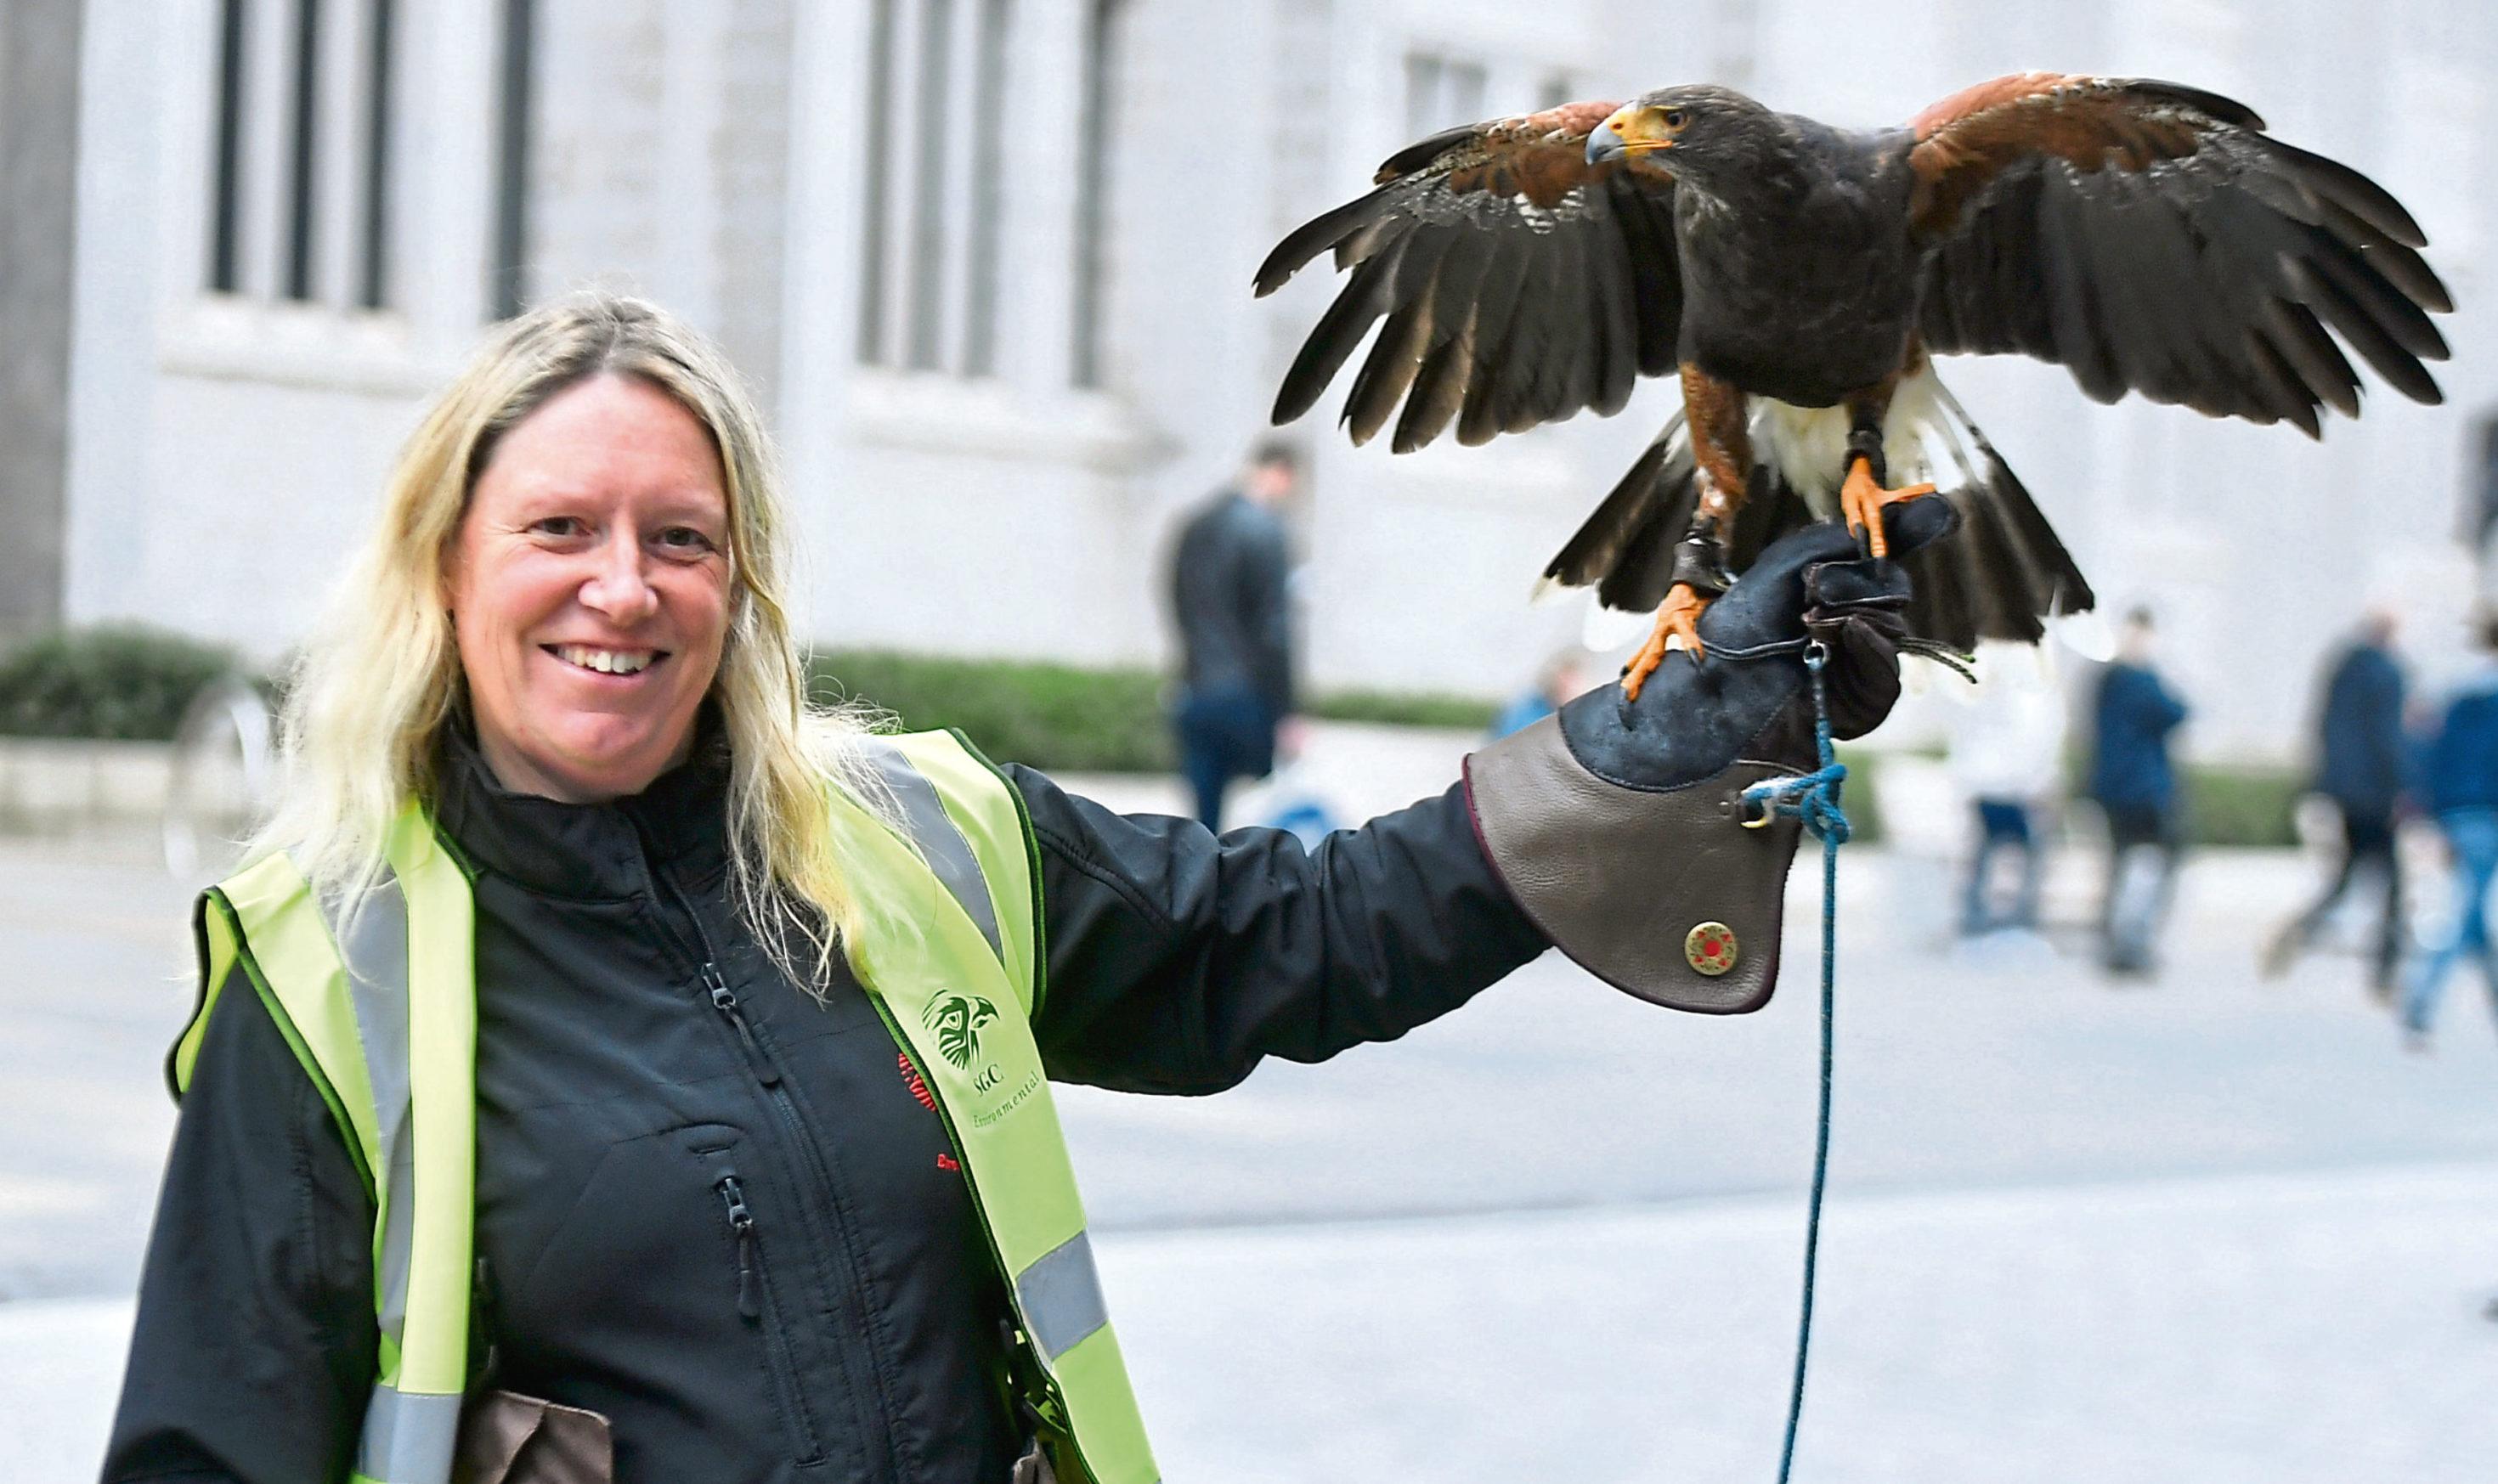 Sarah Calderwood with Saffron the Harris Hawk